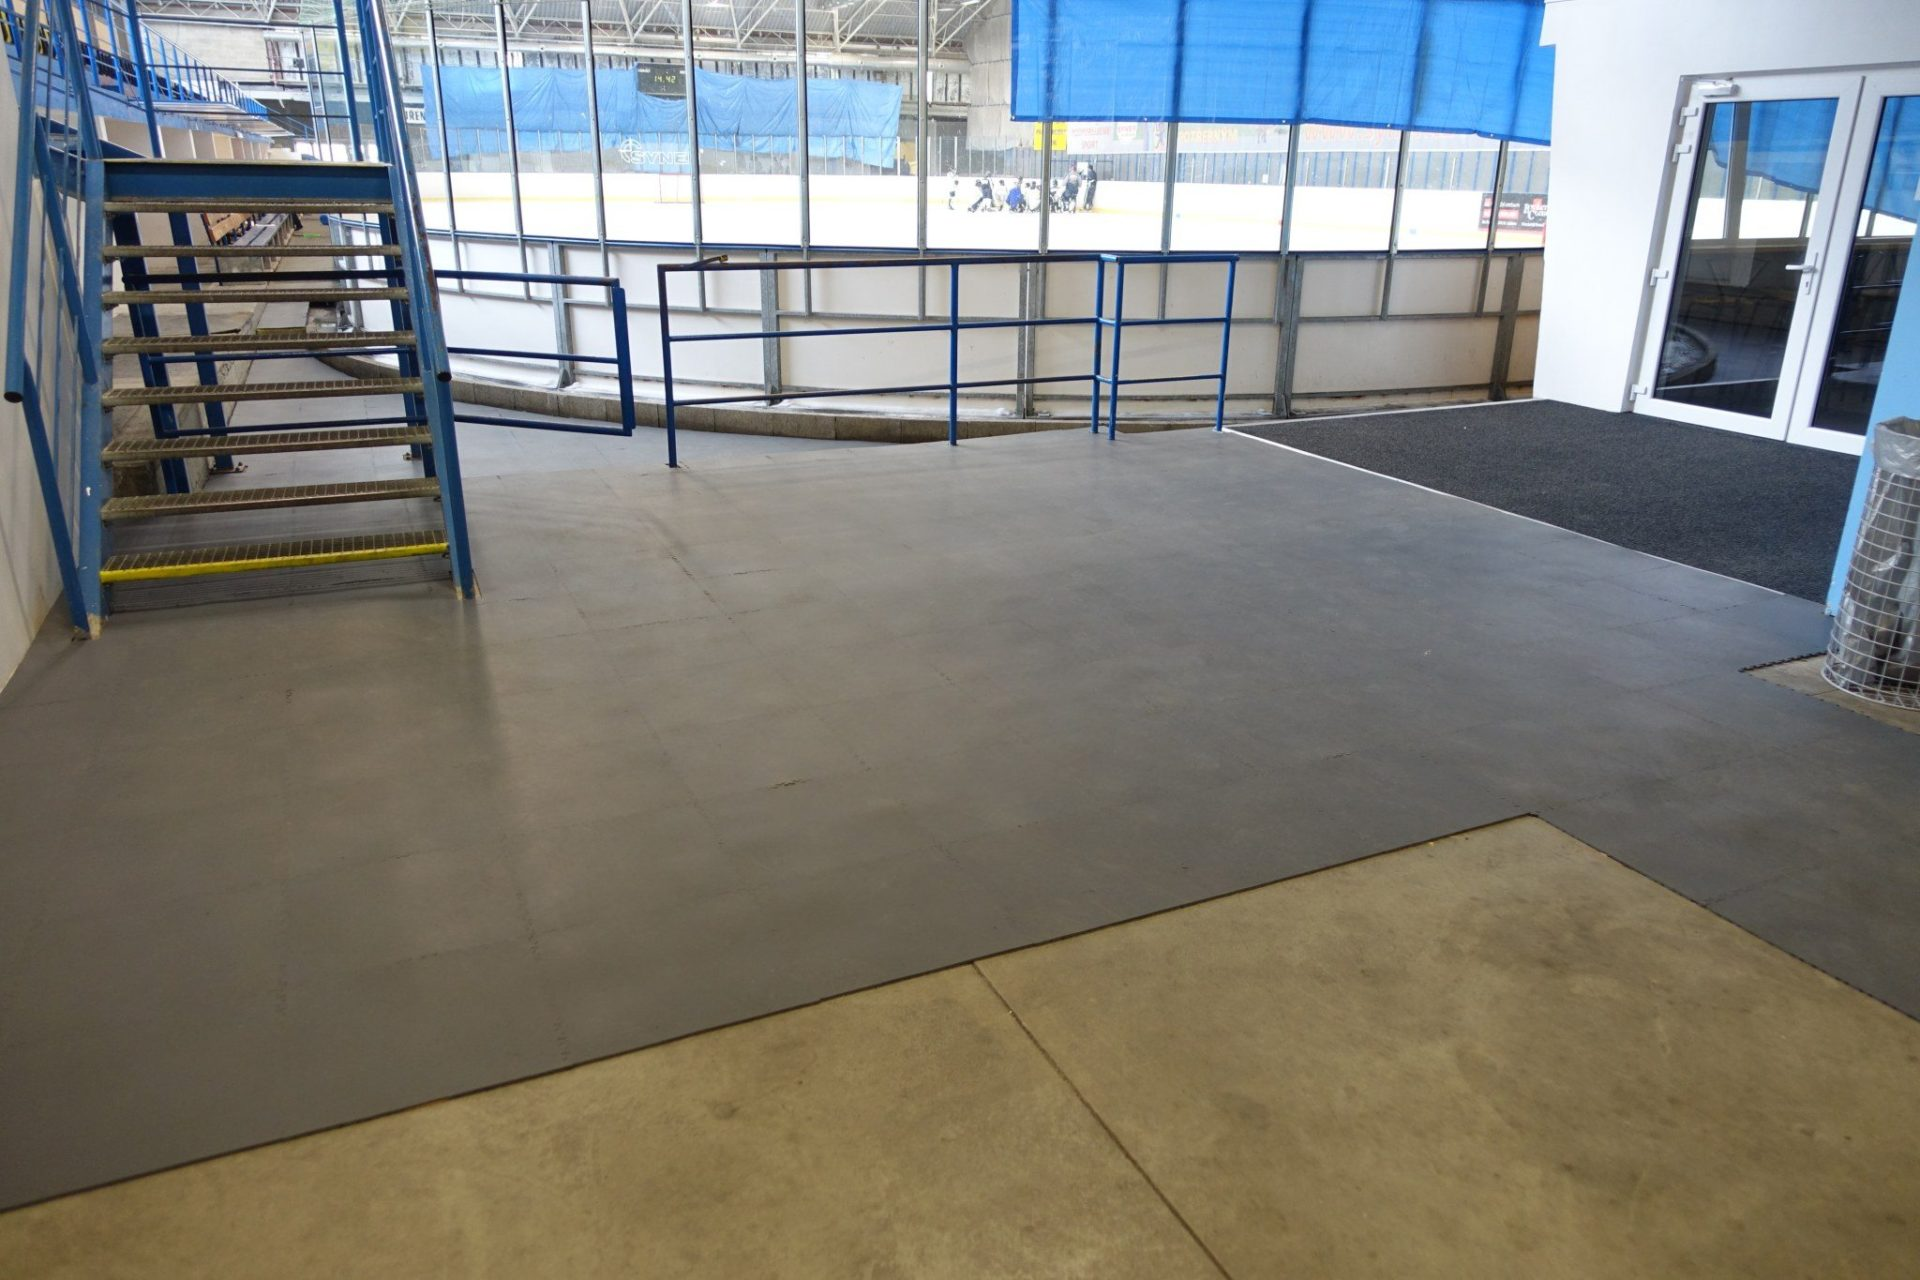 fitnessboden-jp-active-pvc-fliese-platte-geräte-kraftraum-freihantel-kurzhantel-gewichte-aerobic-trx-cardio-funktionale-zone-sport-fitness-fitnessstudio-7